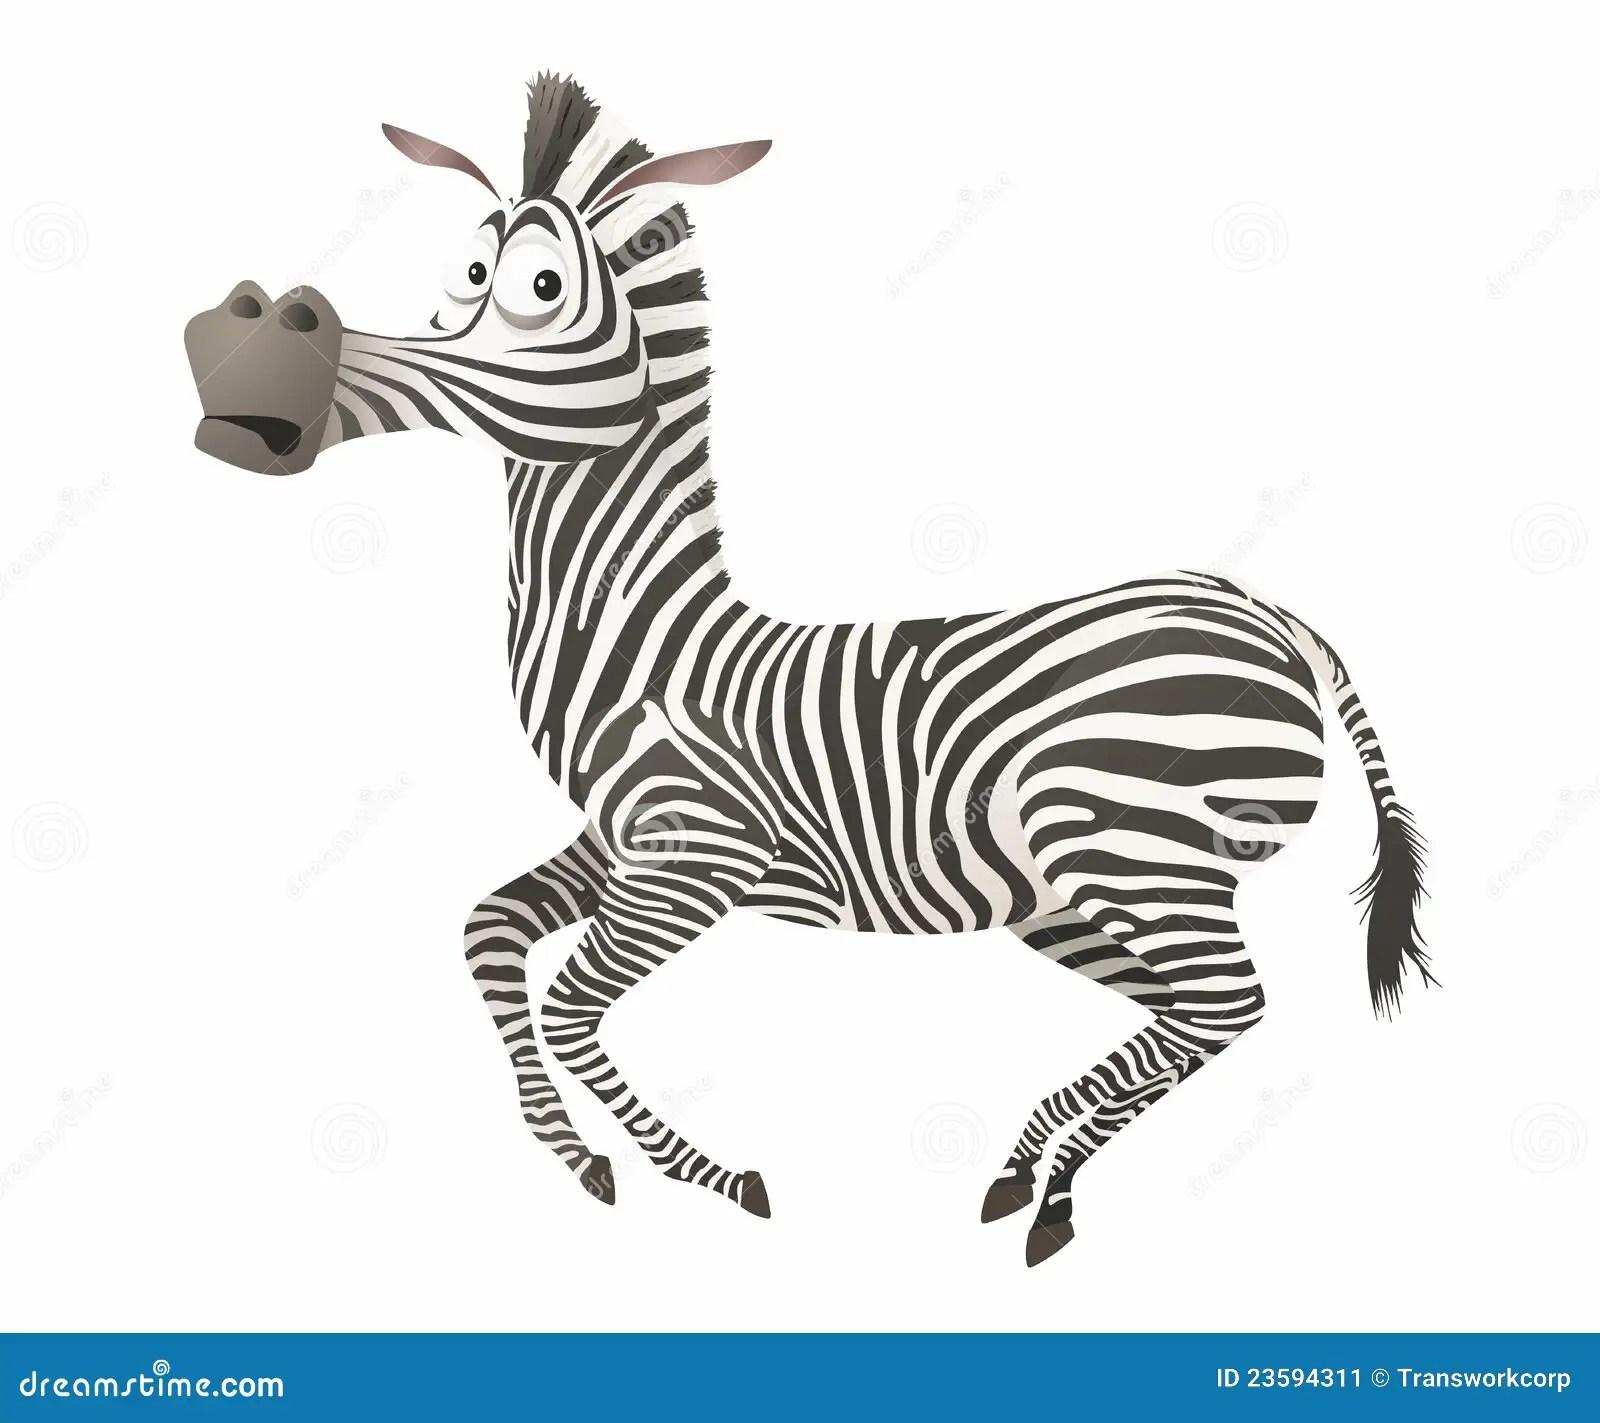 Cartoon Zebra Characterriped Cute Animal Vector